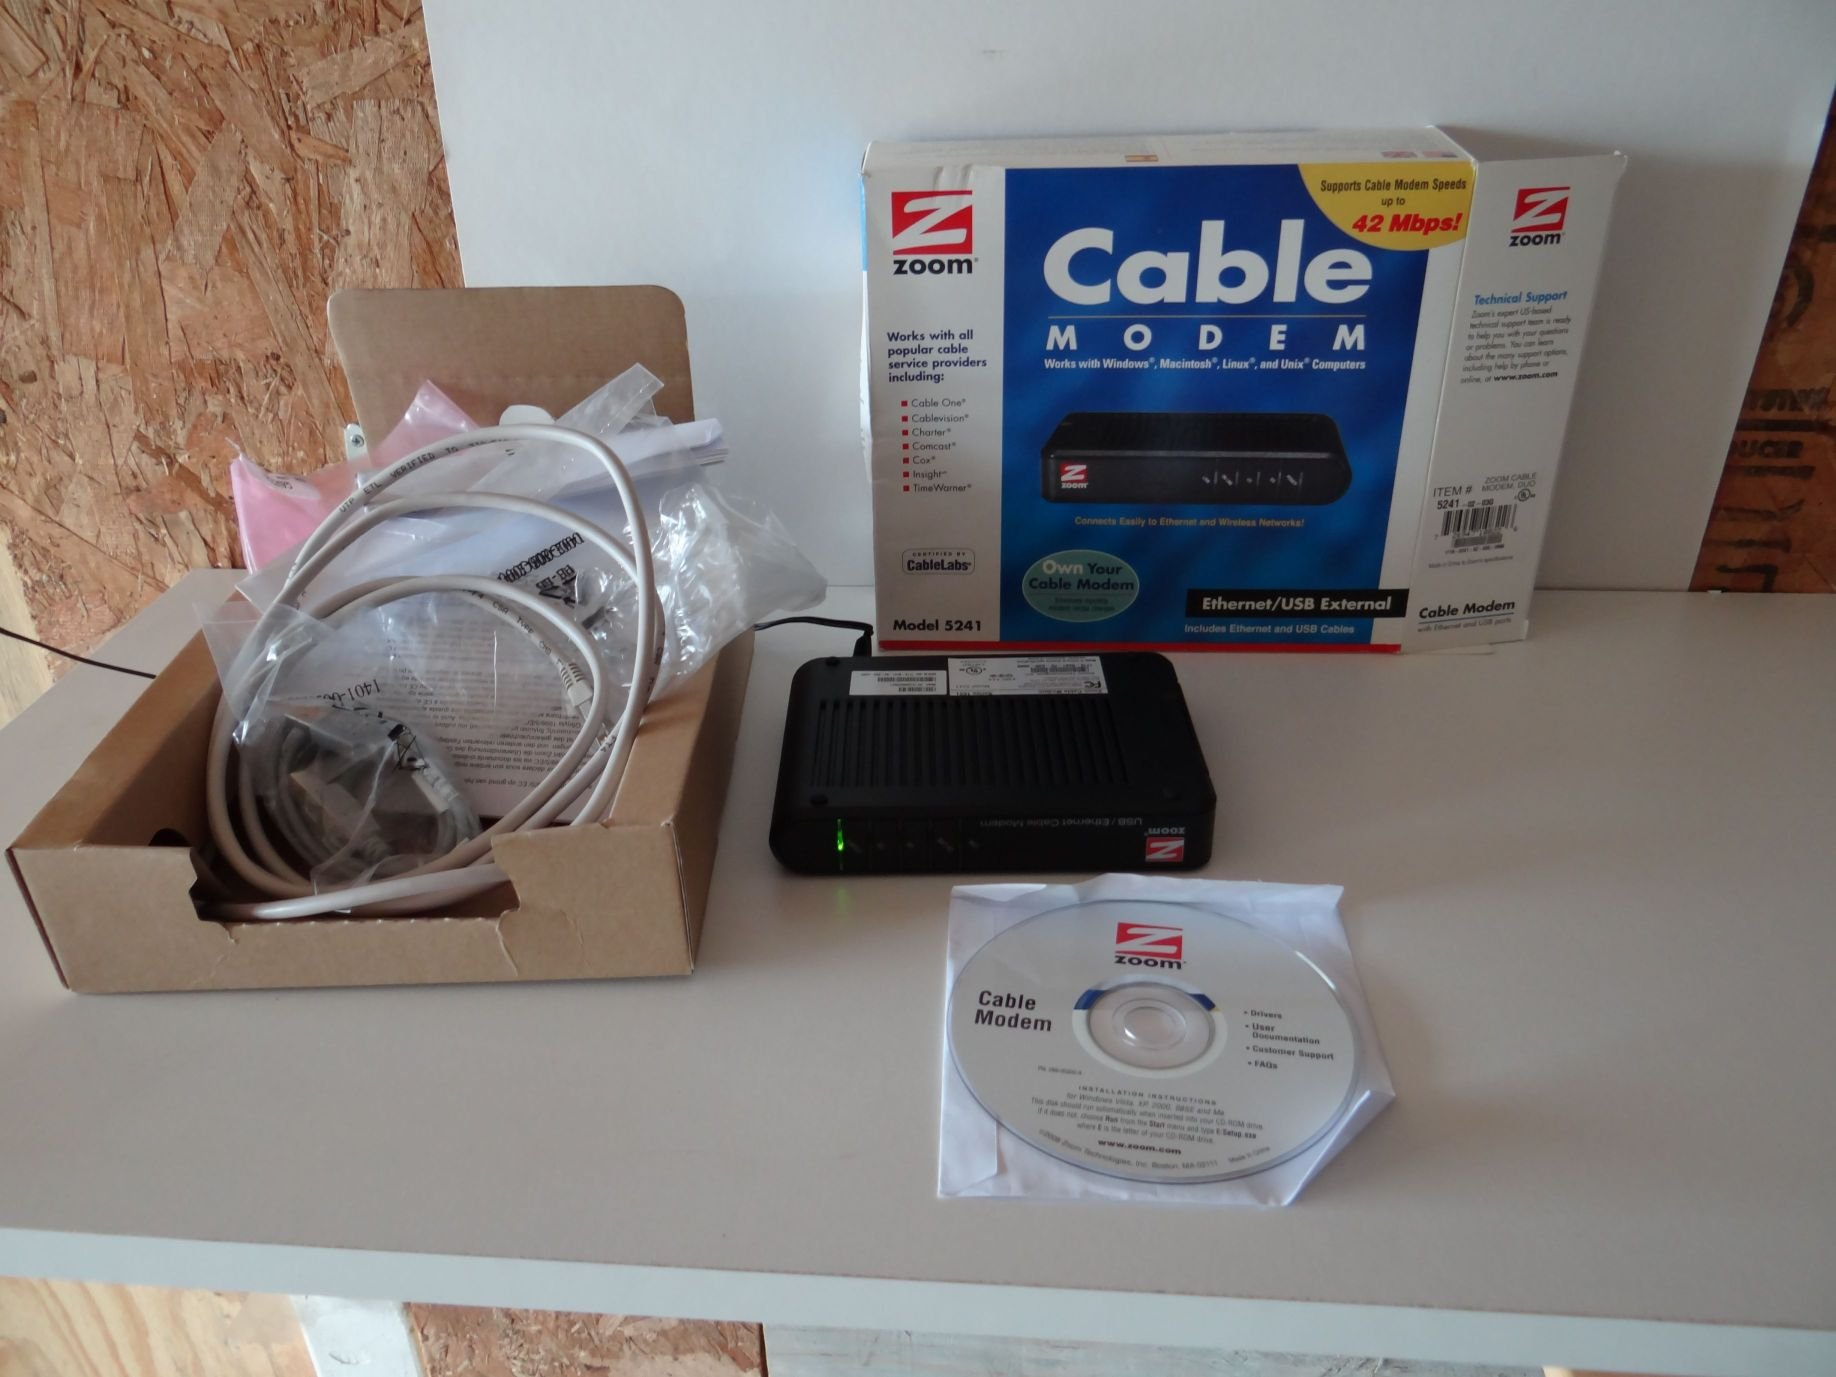 Zoom 5241 Cable Modem USB Ethernet